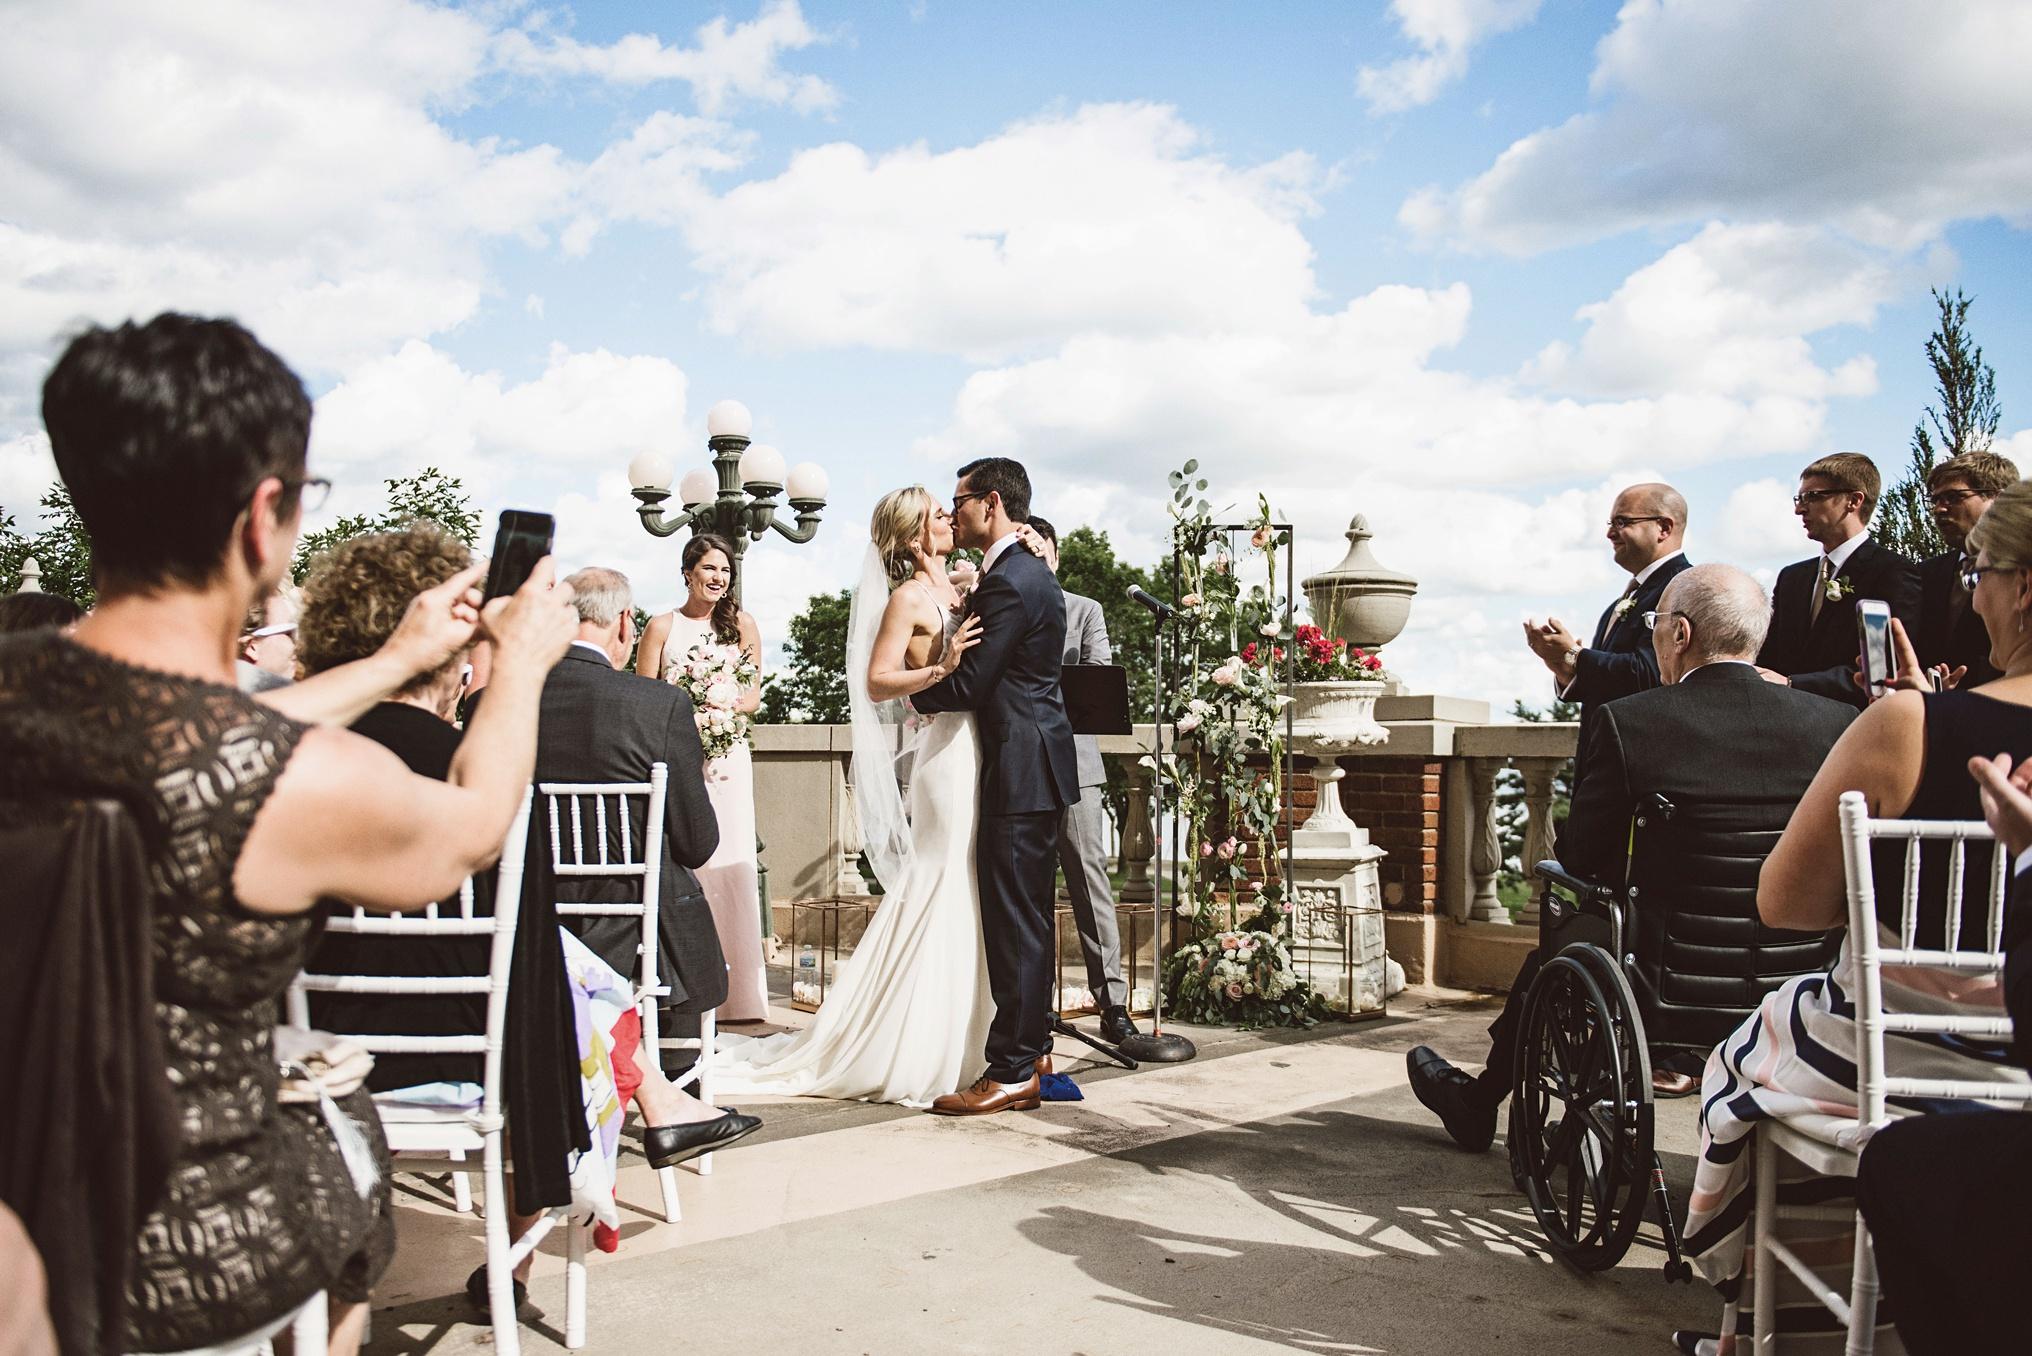 best_wedding_photography_2017_by_lucas_botz_photography_230.jpg